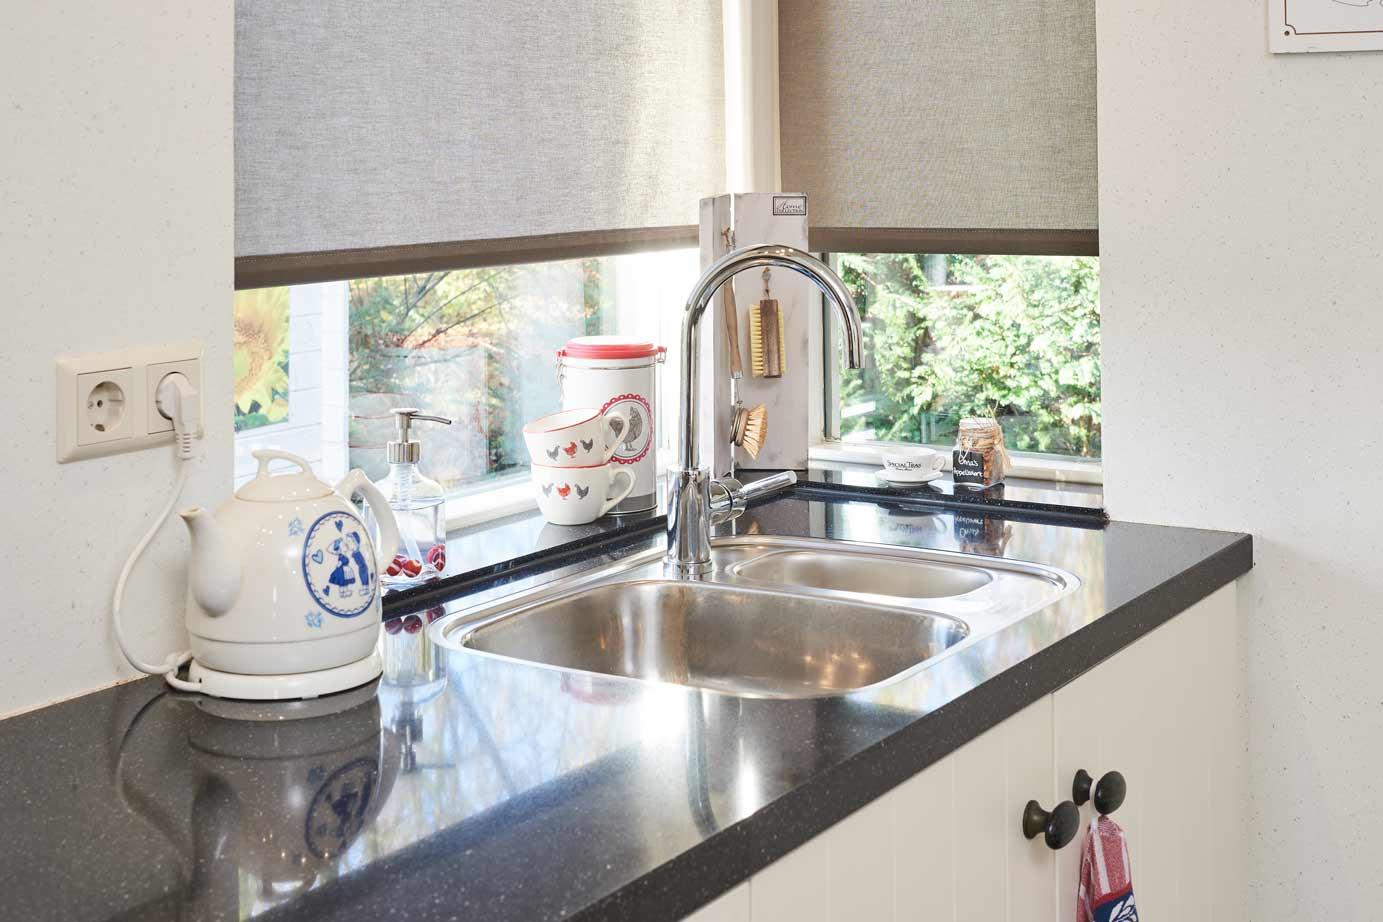 Keukens Zuid Holland : Witte keuken kopen in zuid holland bekijk binnenkijker db keukens